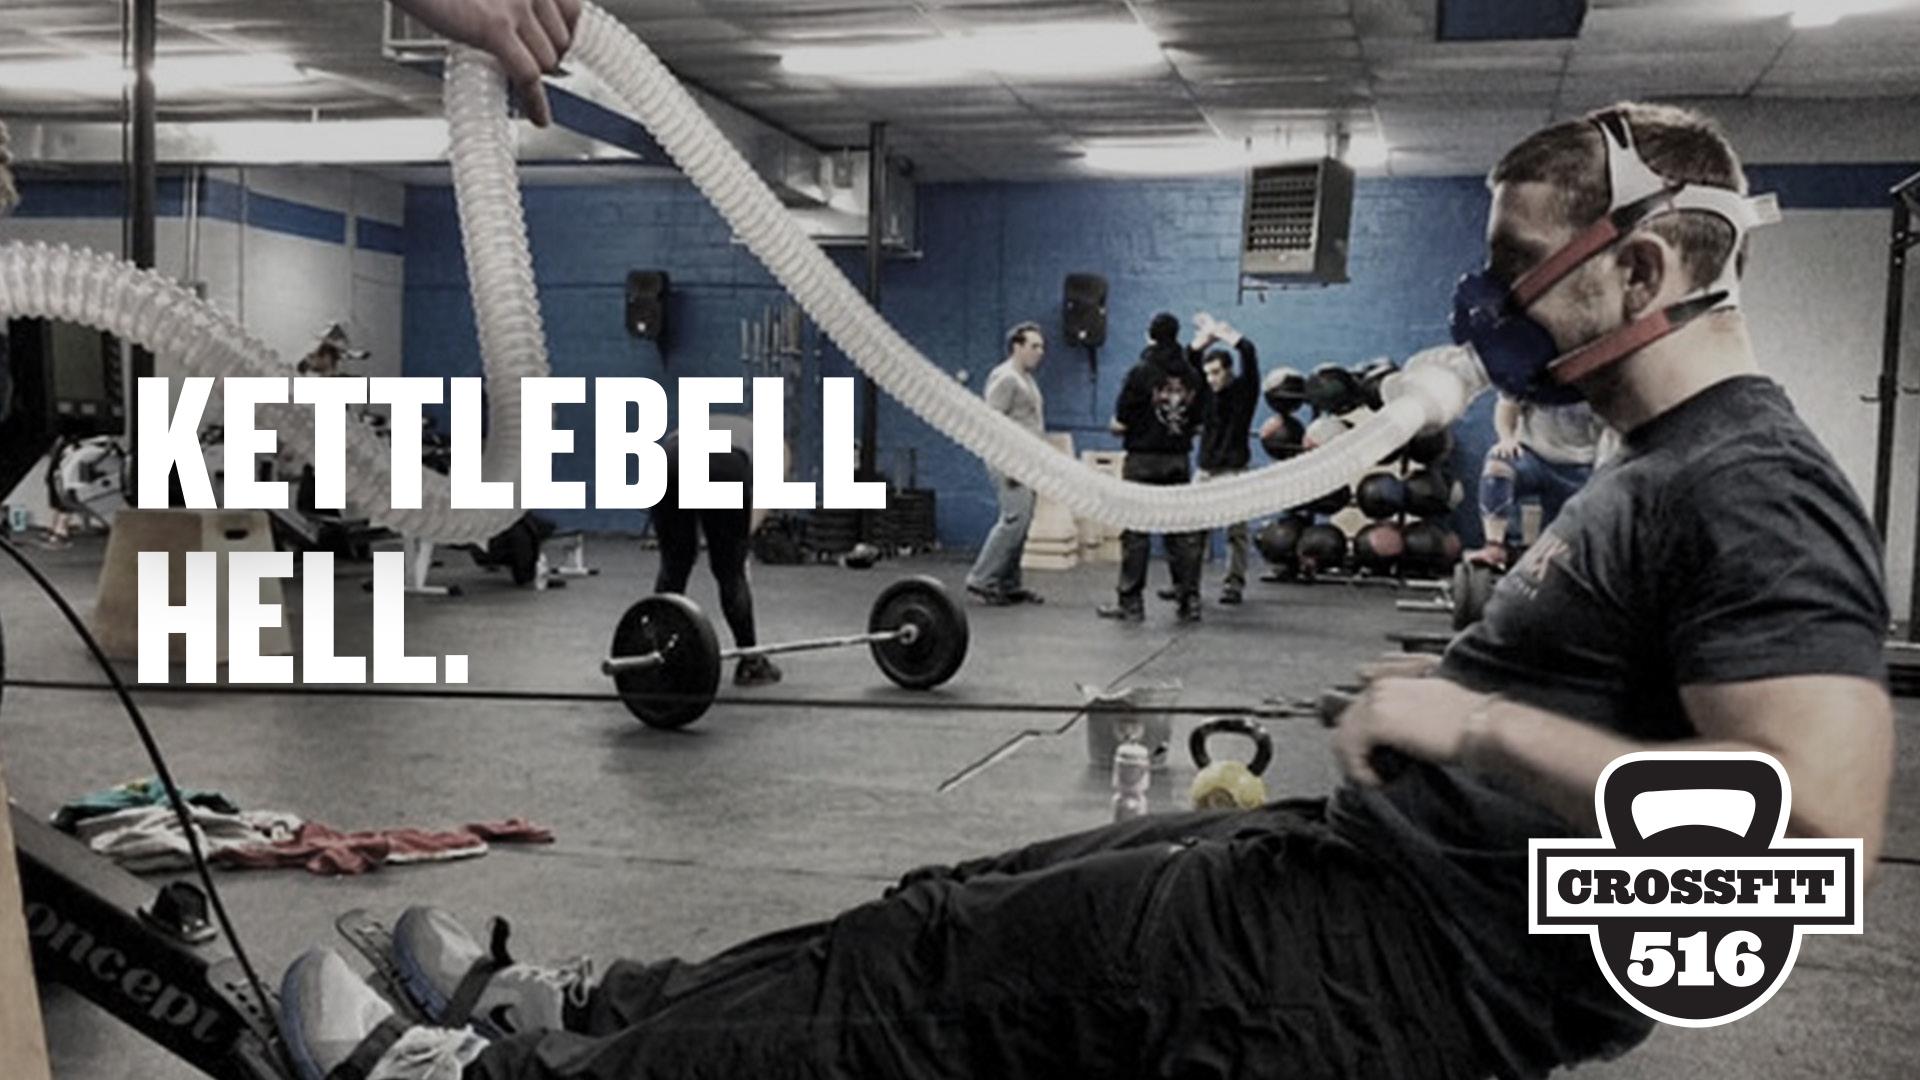 kettlebell-hell